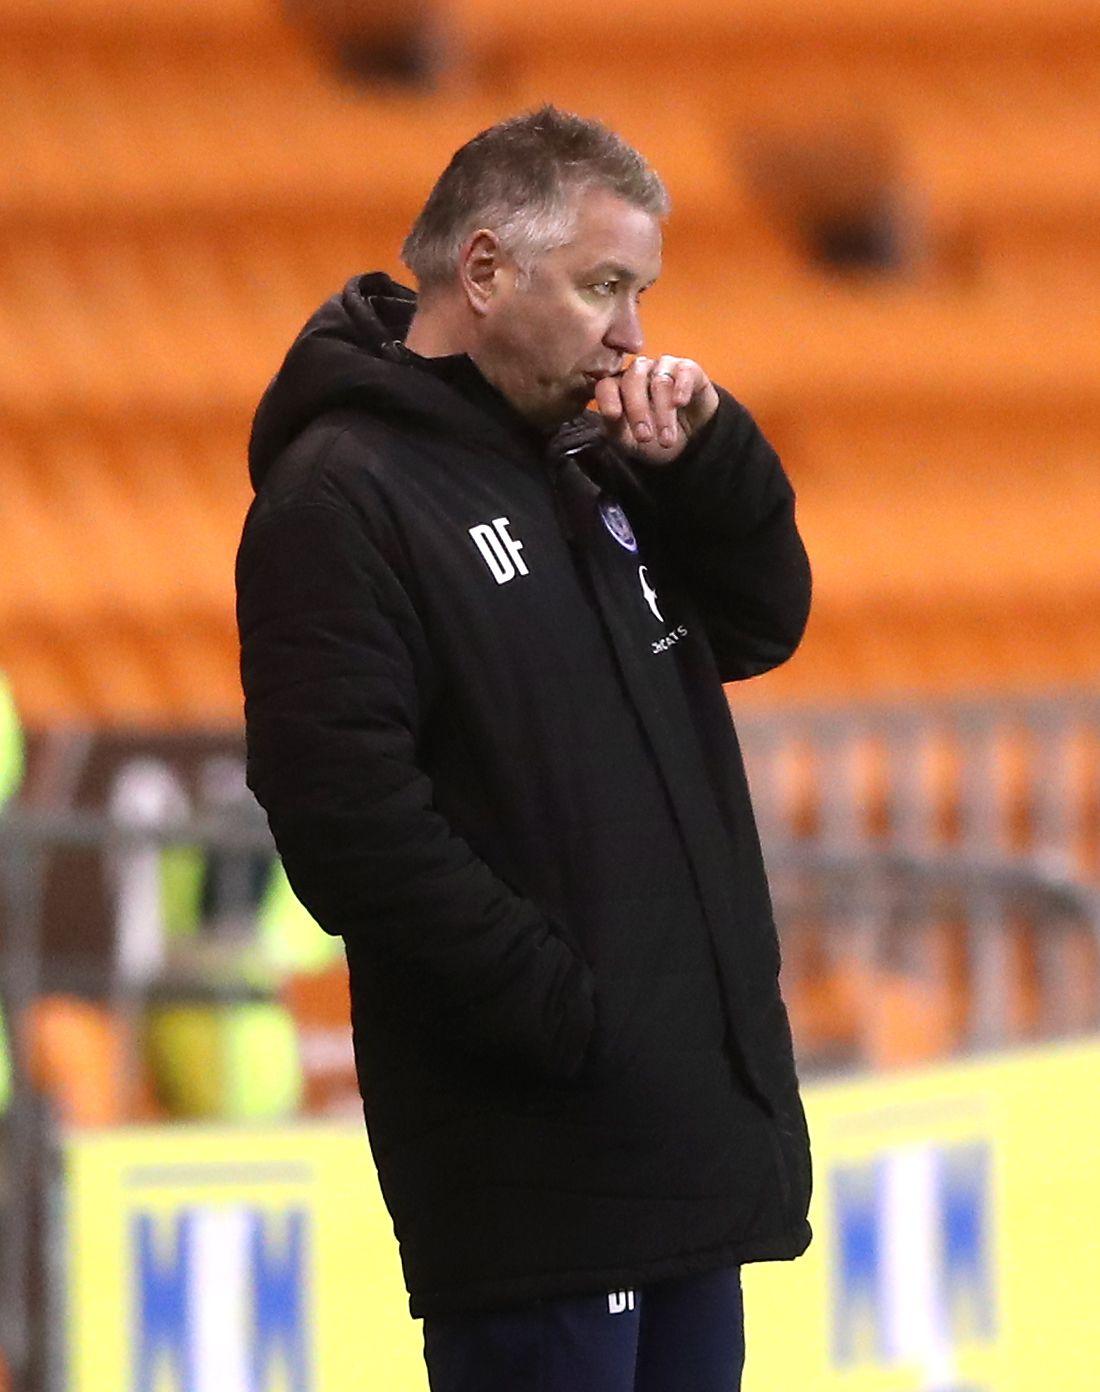 Blackpool v Peterborough United - Sky Bet League One - Bloomfield Road